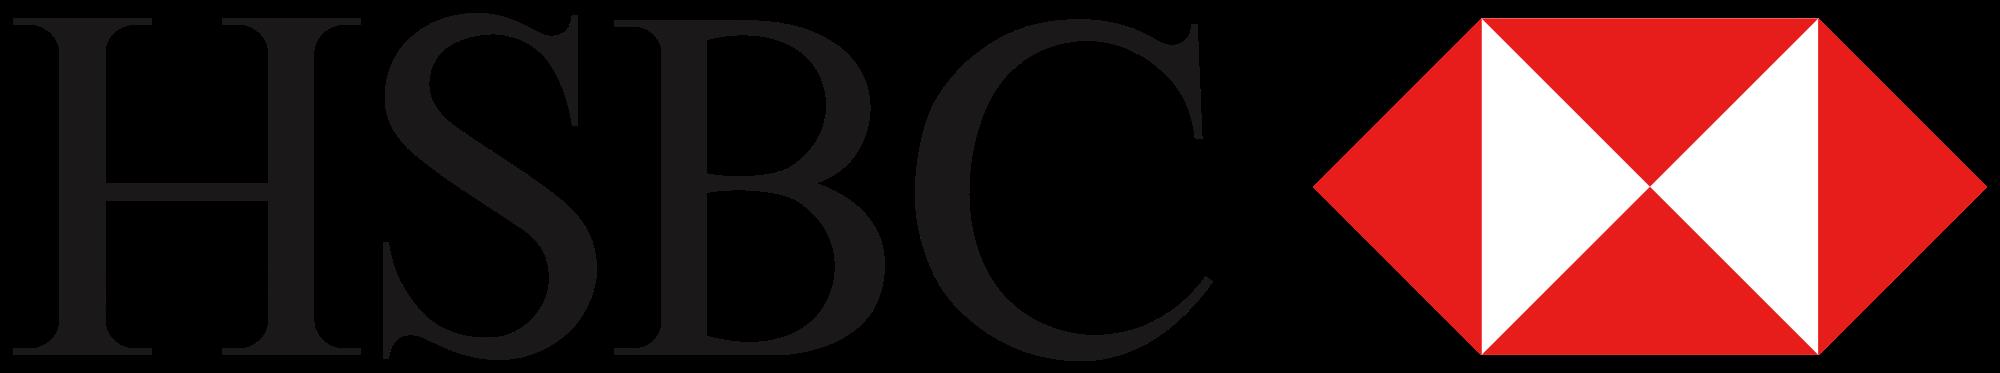 Hsbc Logo Related Keyw...